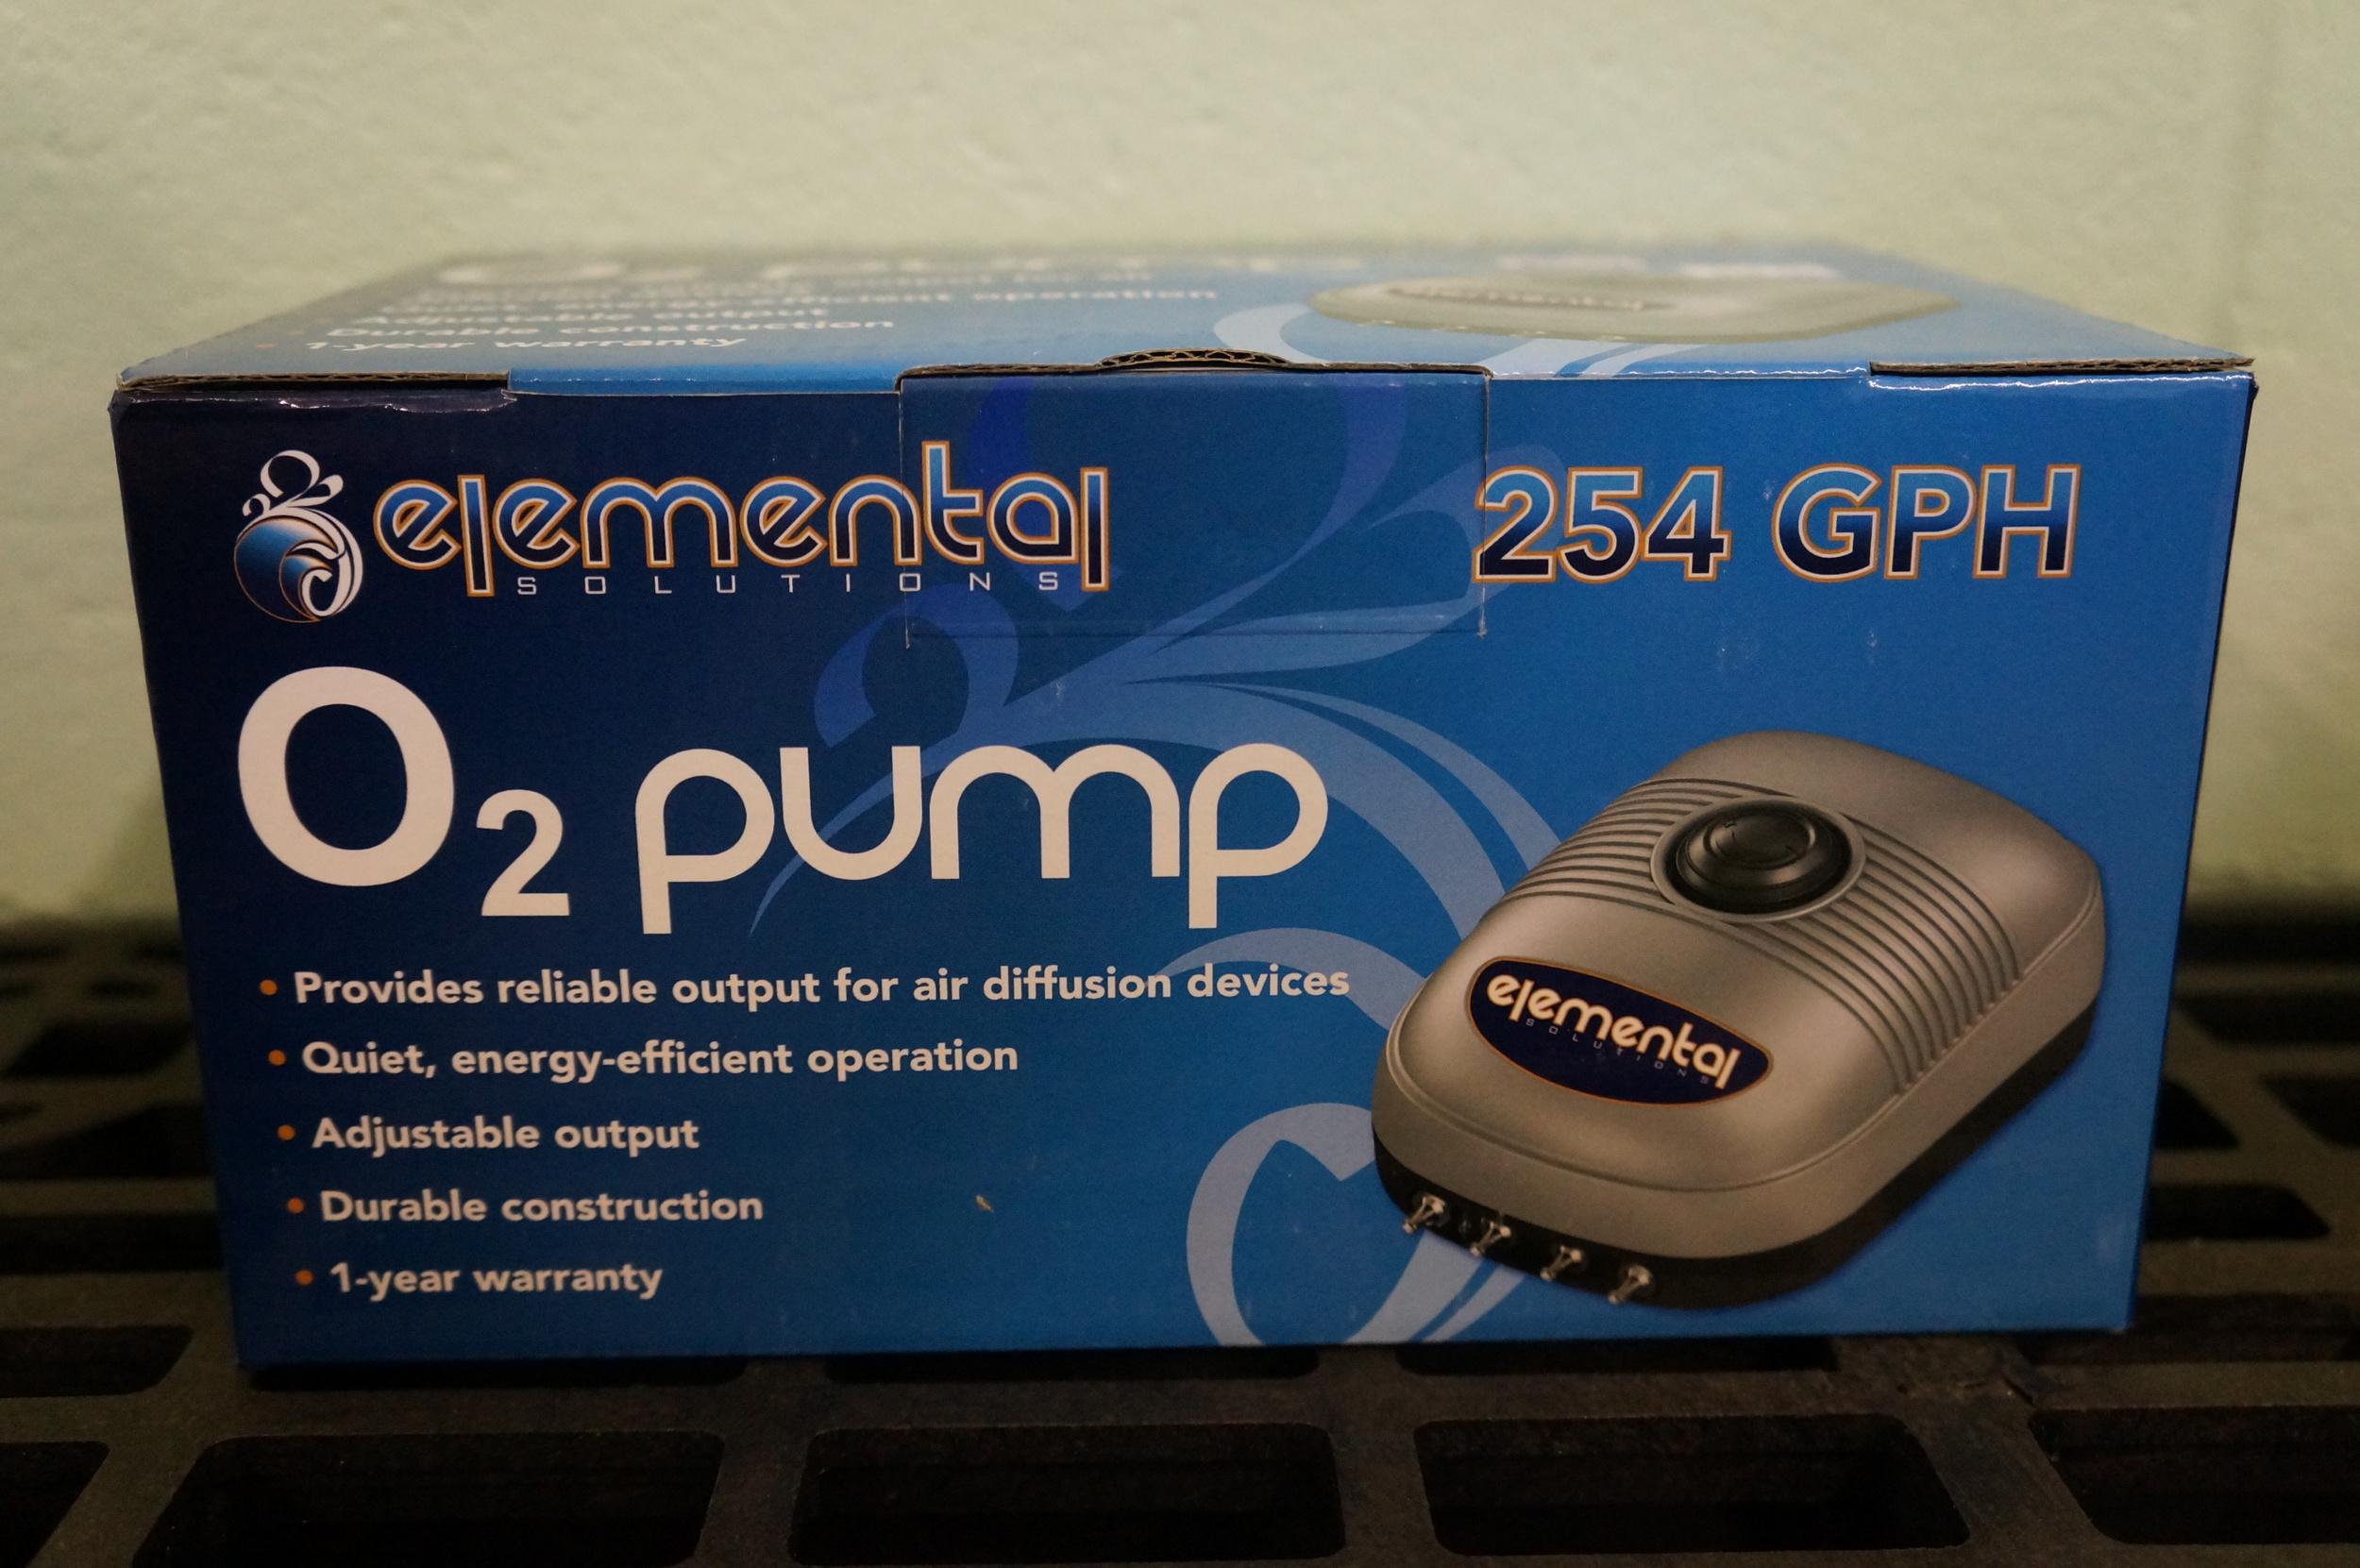 Elemental 254 GPH Pump